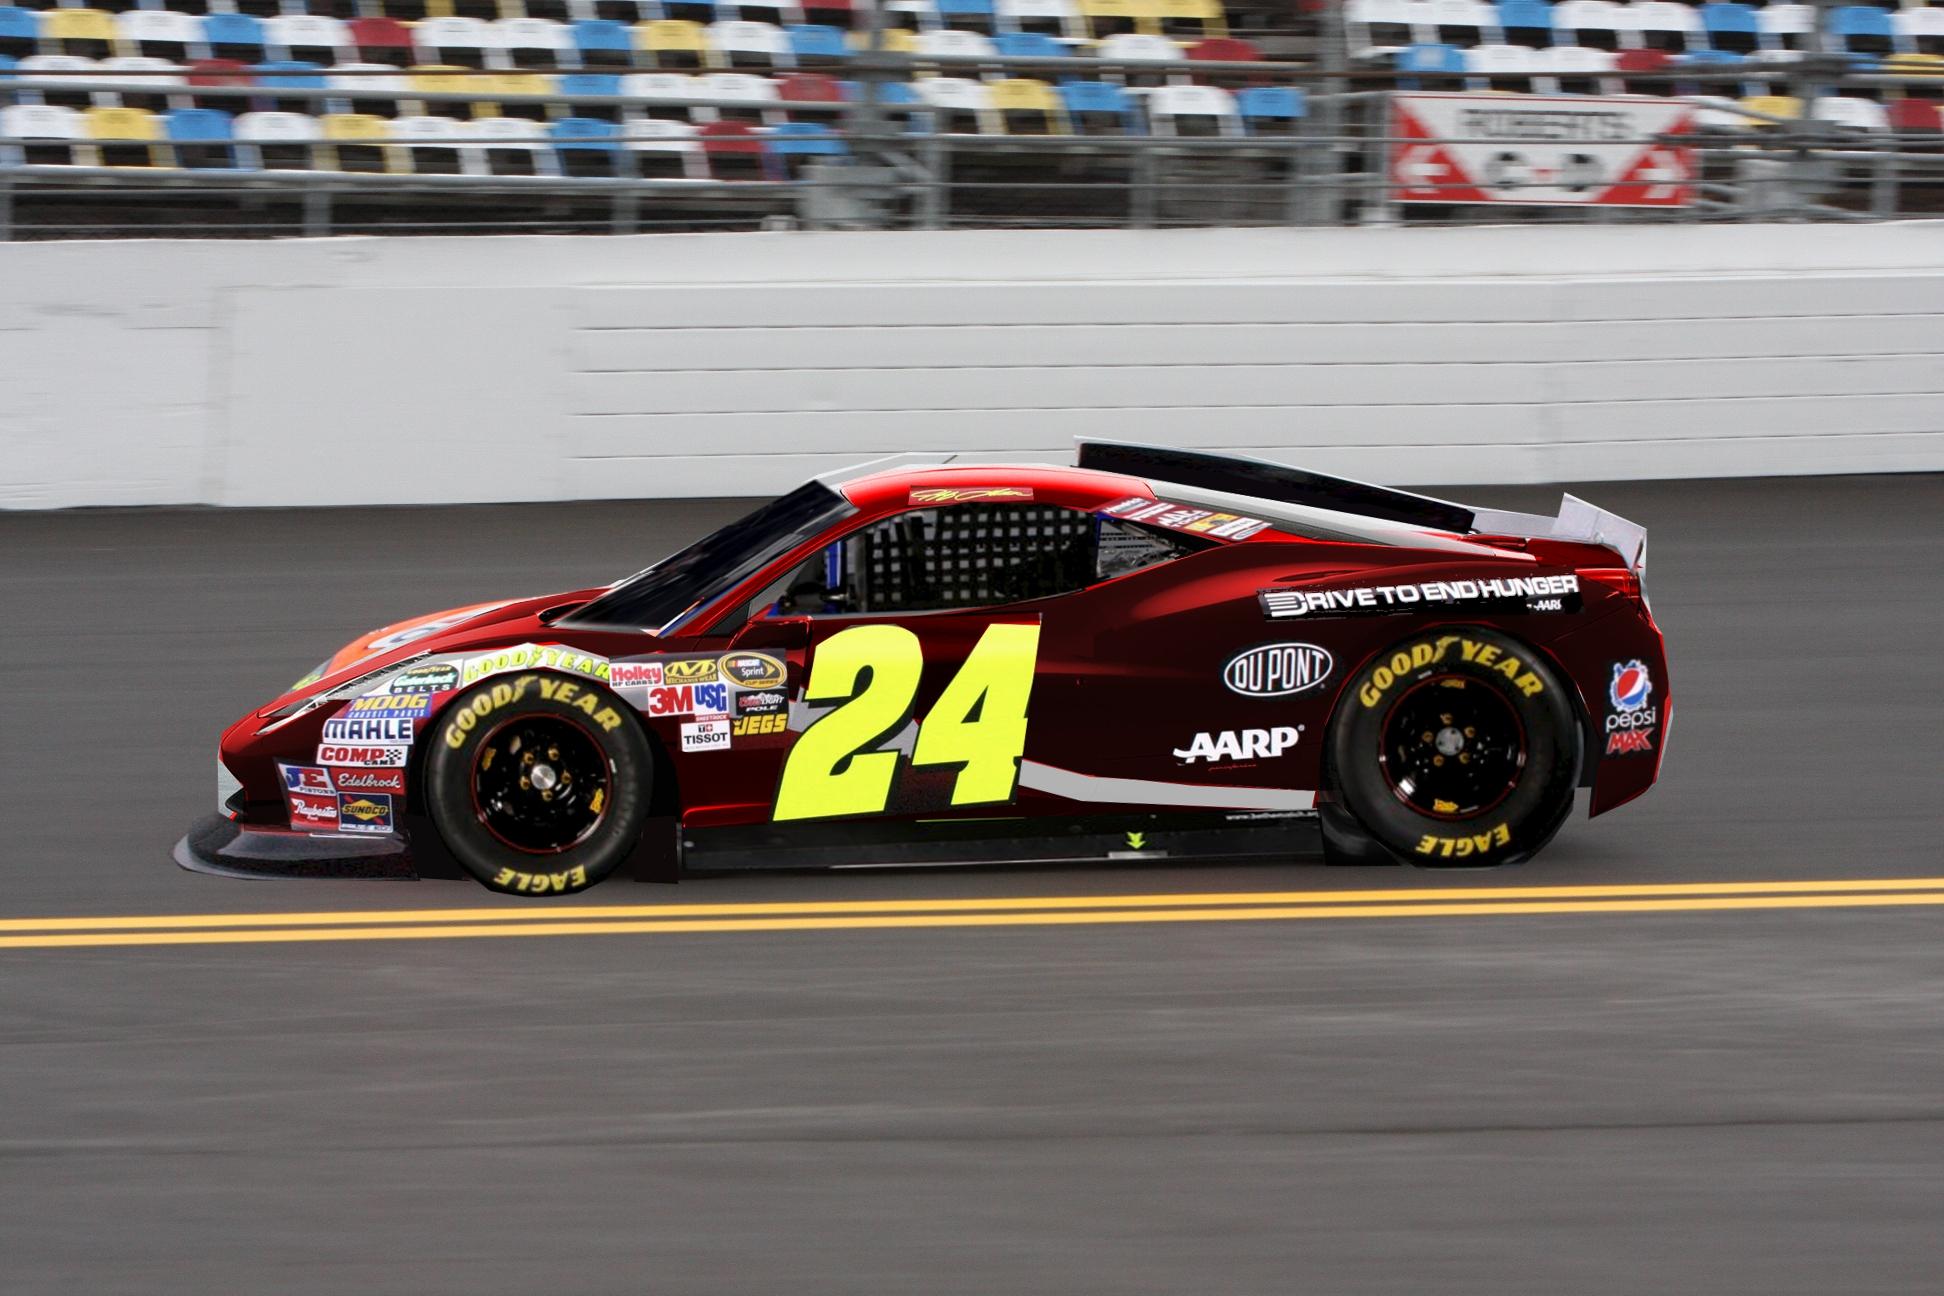 Race Car Tire Brands